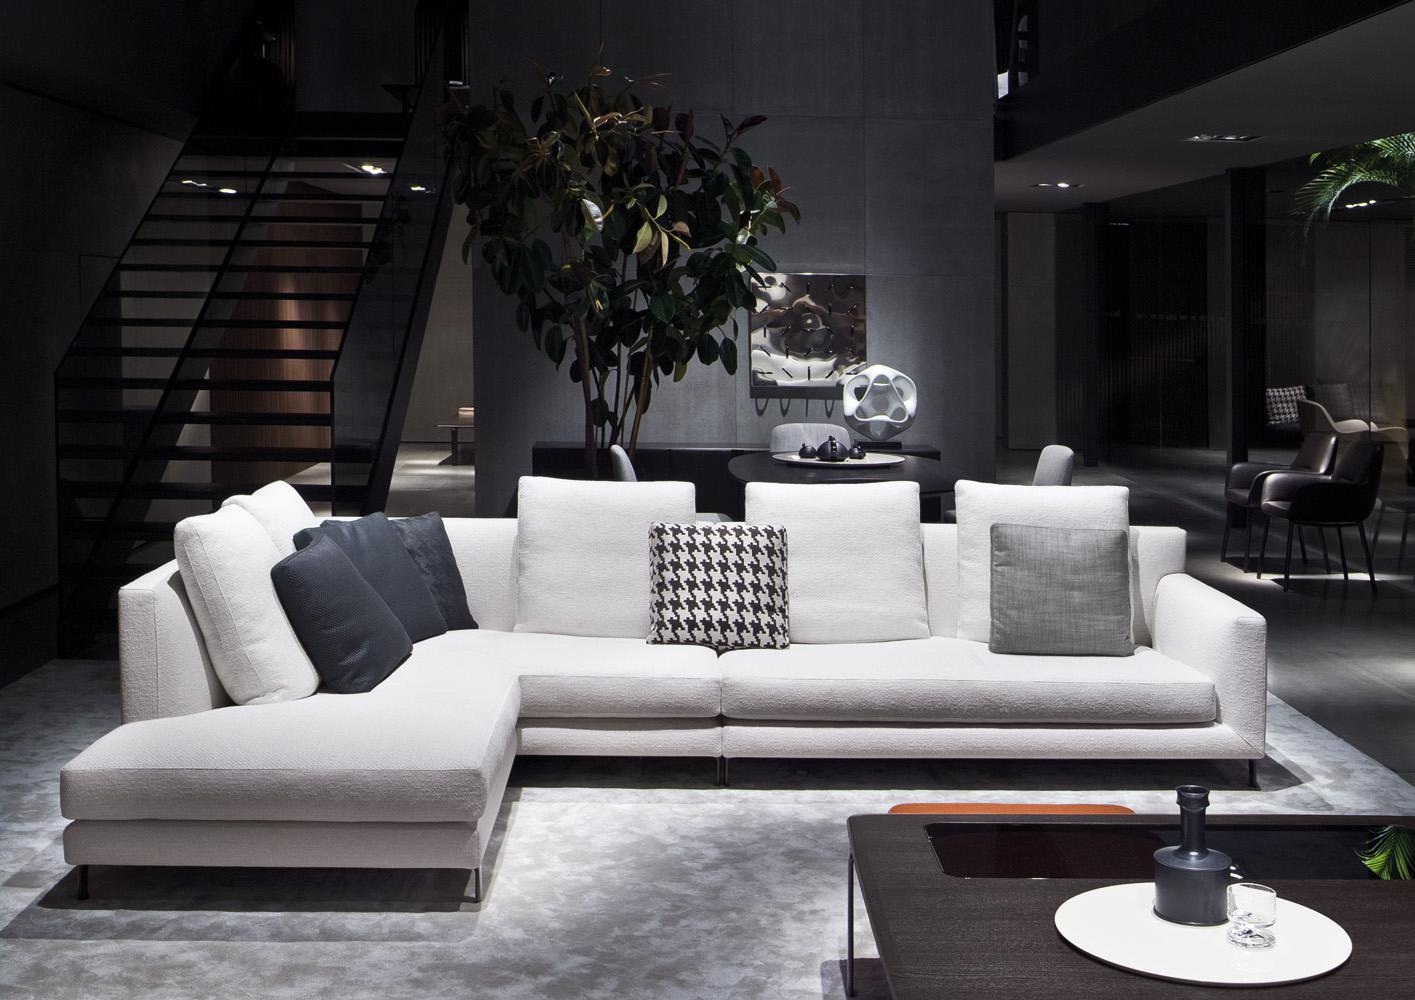 Decoraci n de salones modernos estilo minimalista hoy for Decoracion salas minimalistas modernas